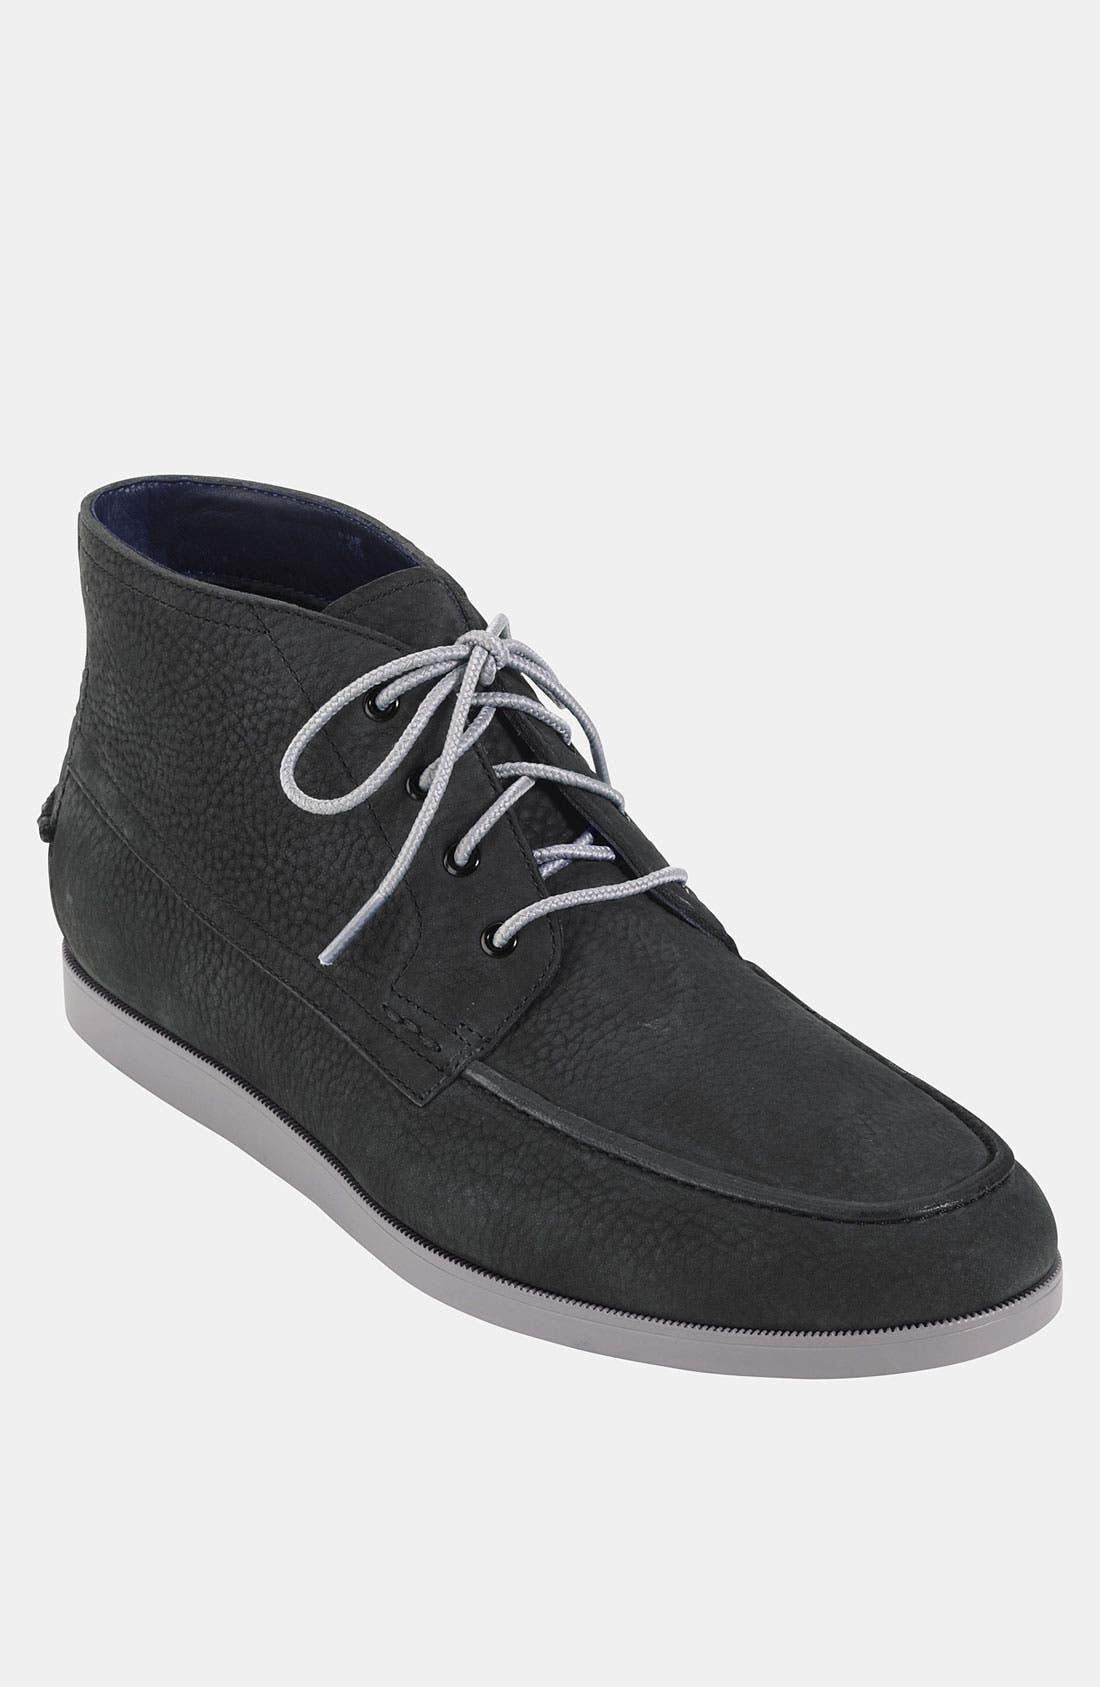 Alternate Image 1 Selected - Cole Haan 'Air Mason' Moc Toe Boot